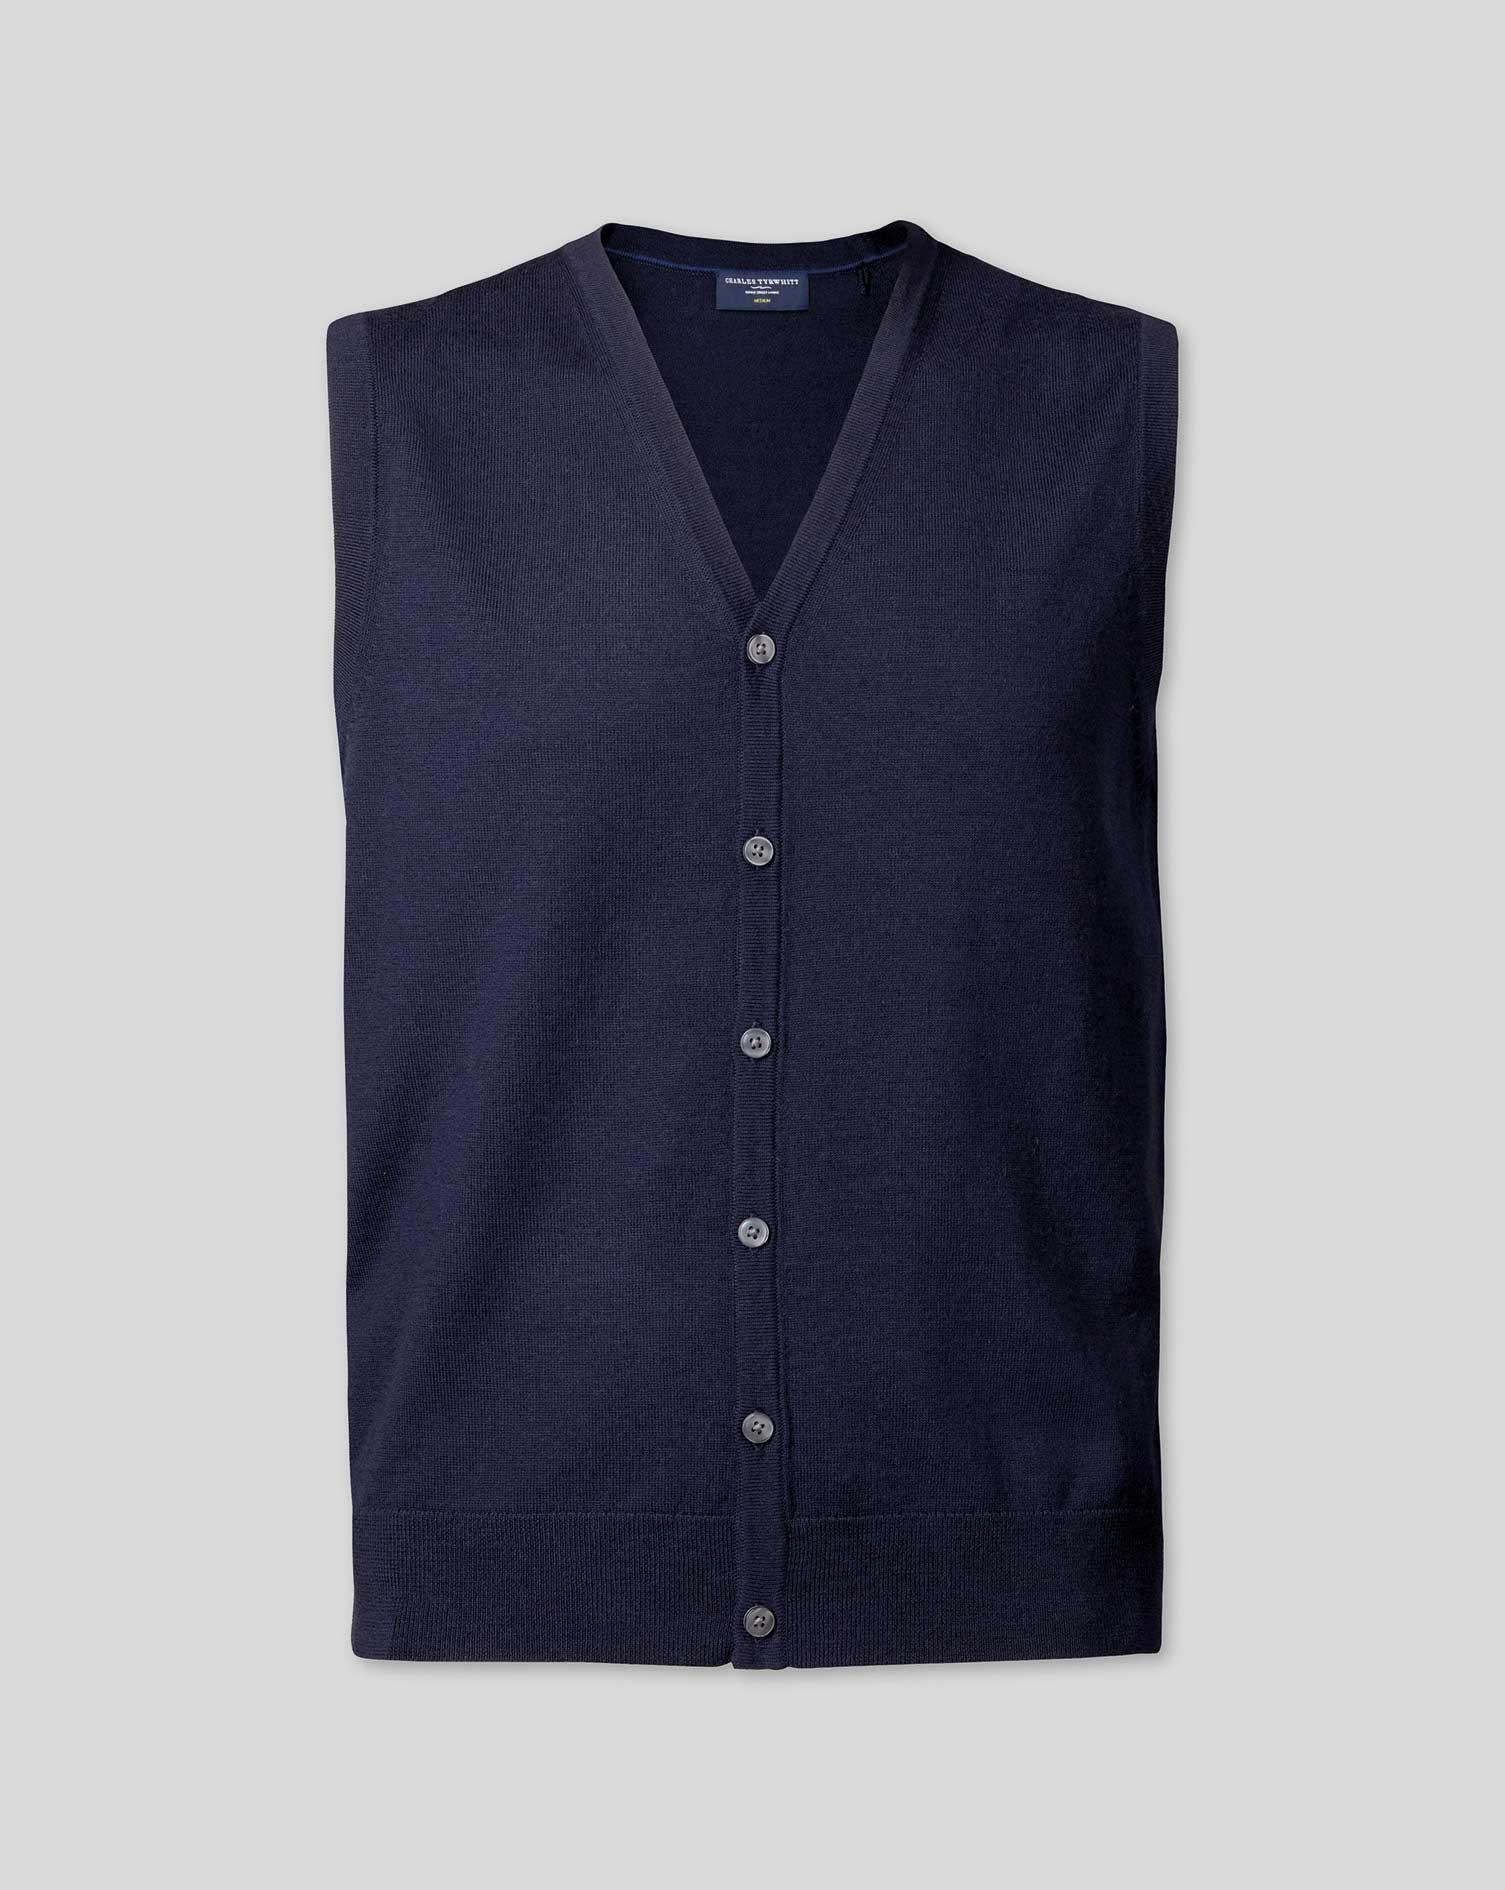 Merino Waistcoat - Navy Size Large by - Charles Tyrwhitt - Modalova